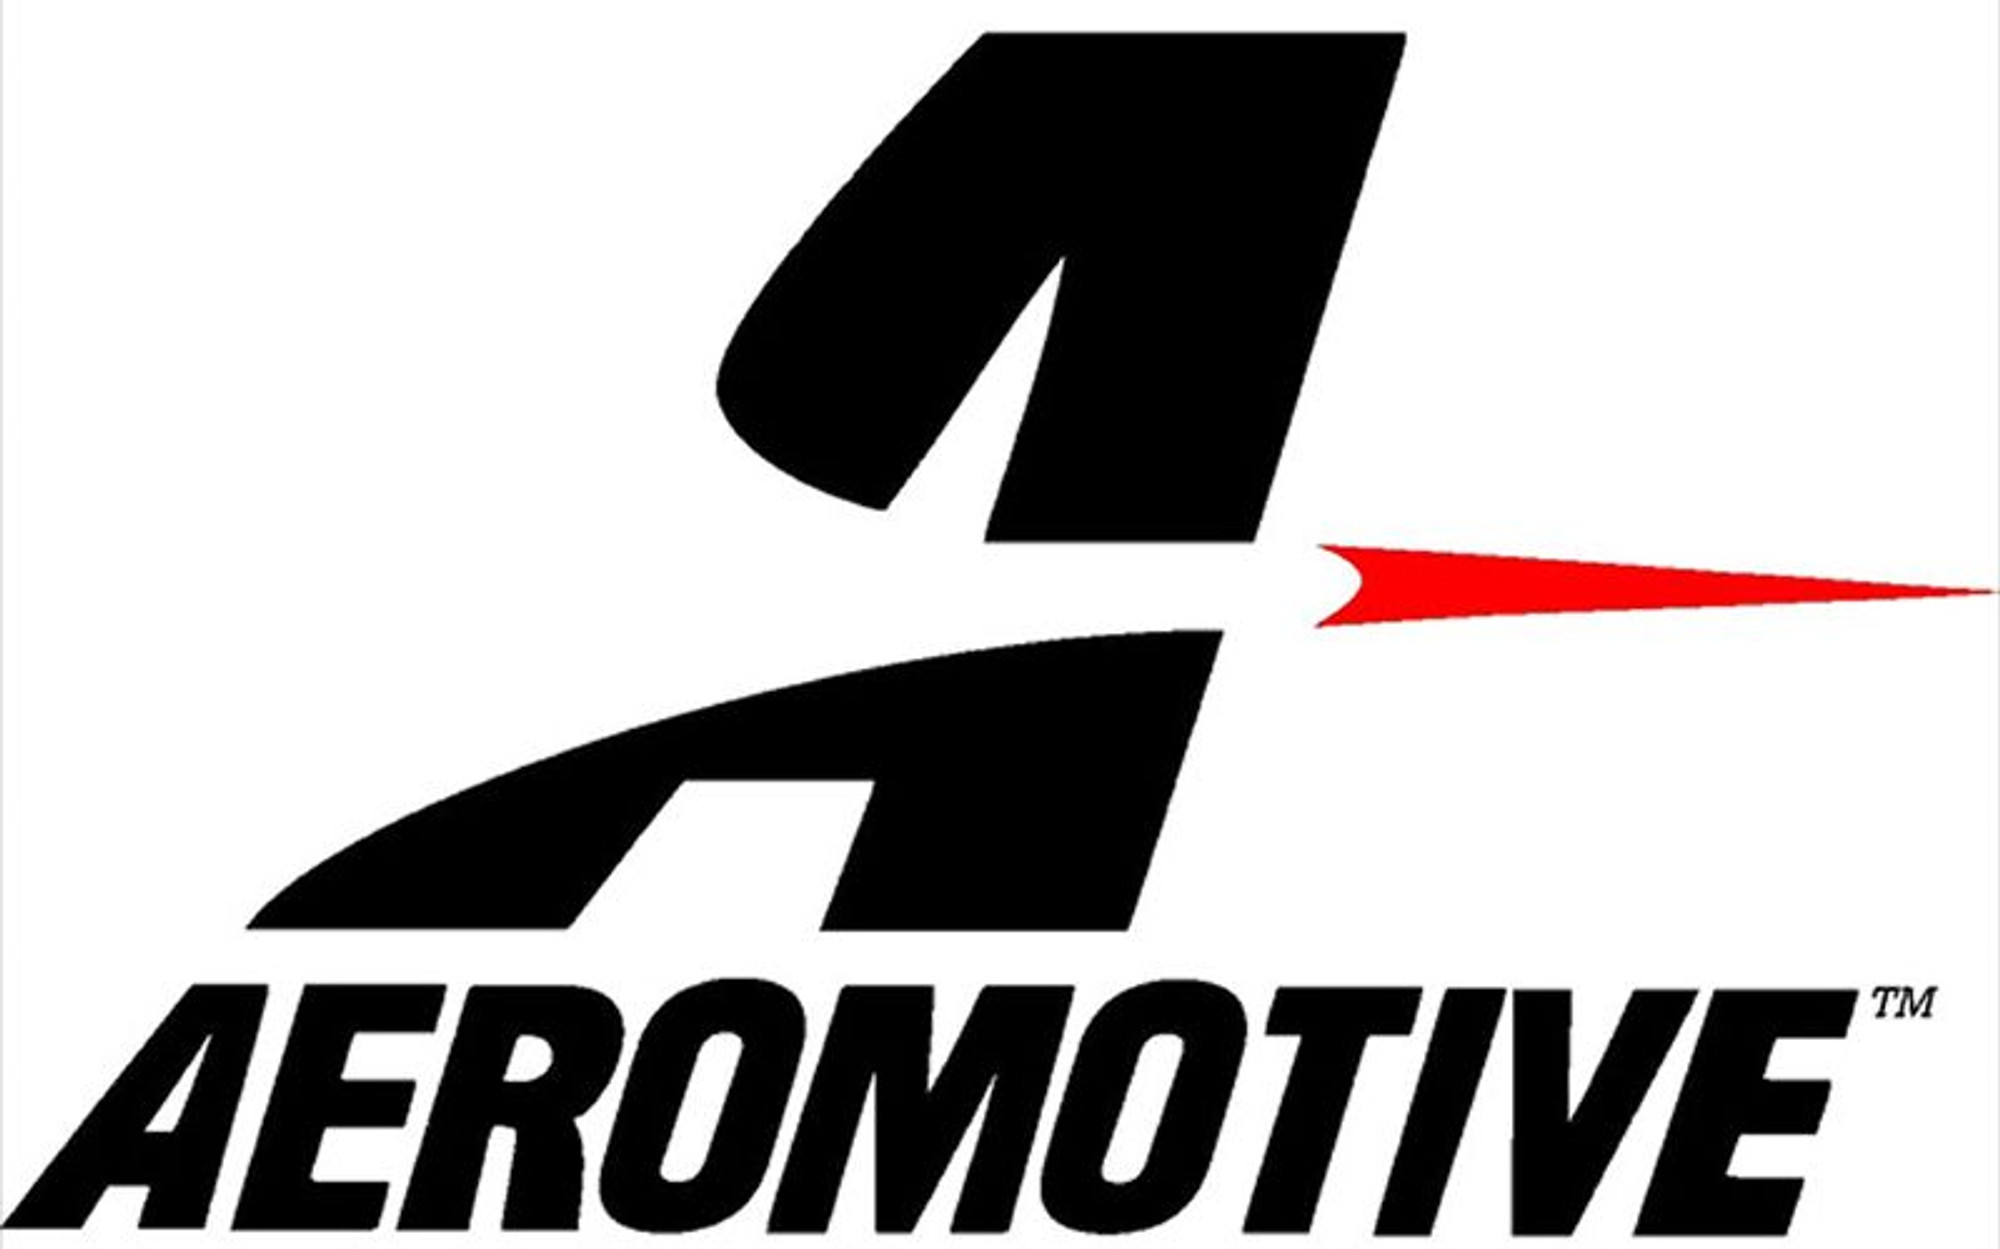 Performance & Racing Parts Parts & Accessories Aeromotive 16307 Fuel Pump Wiring  Harness 30A Connectors/Relay/Wire/Cable Ties | Aeromotive Wiring Harness |  | Han Kjøbenhavn